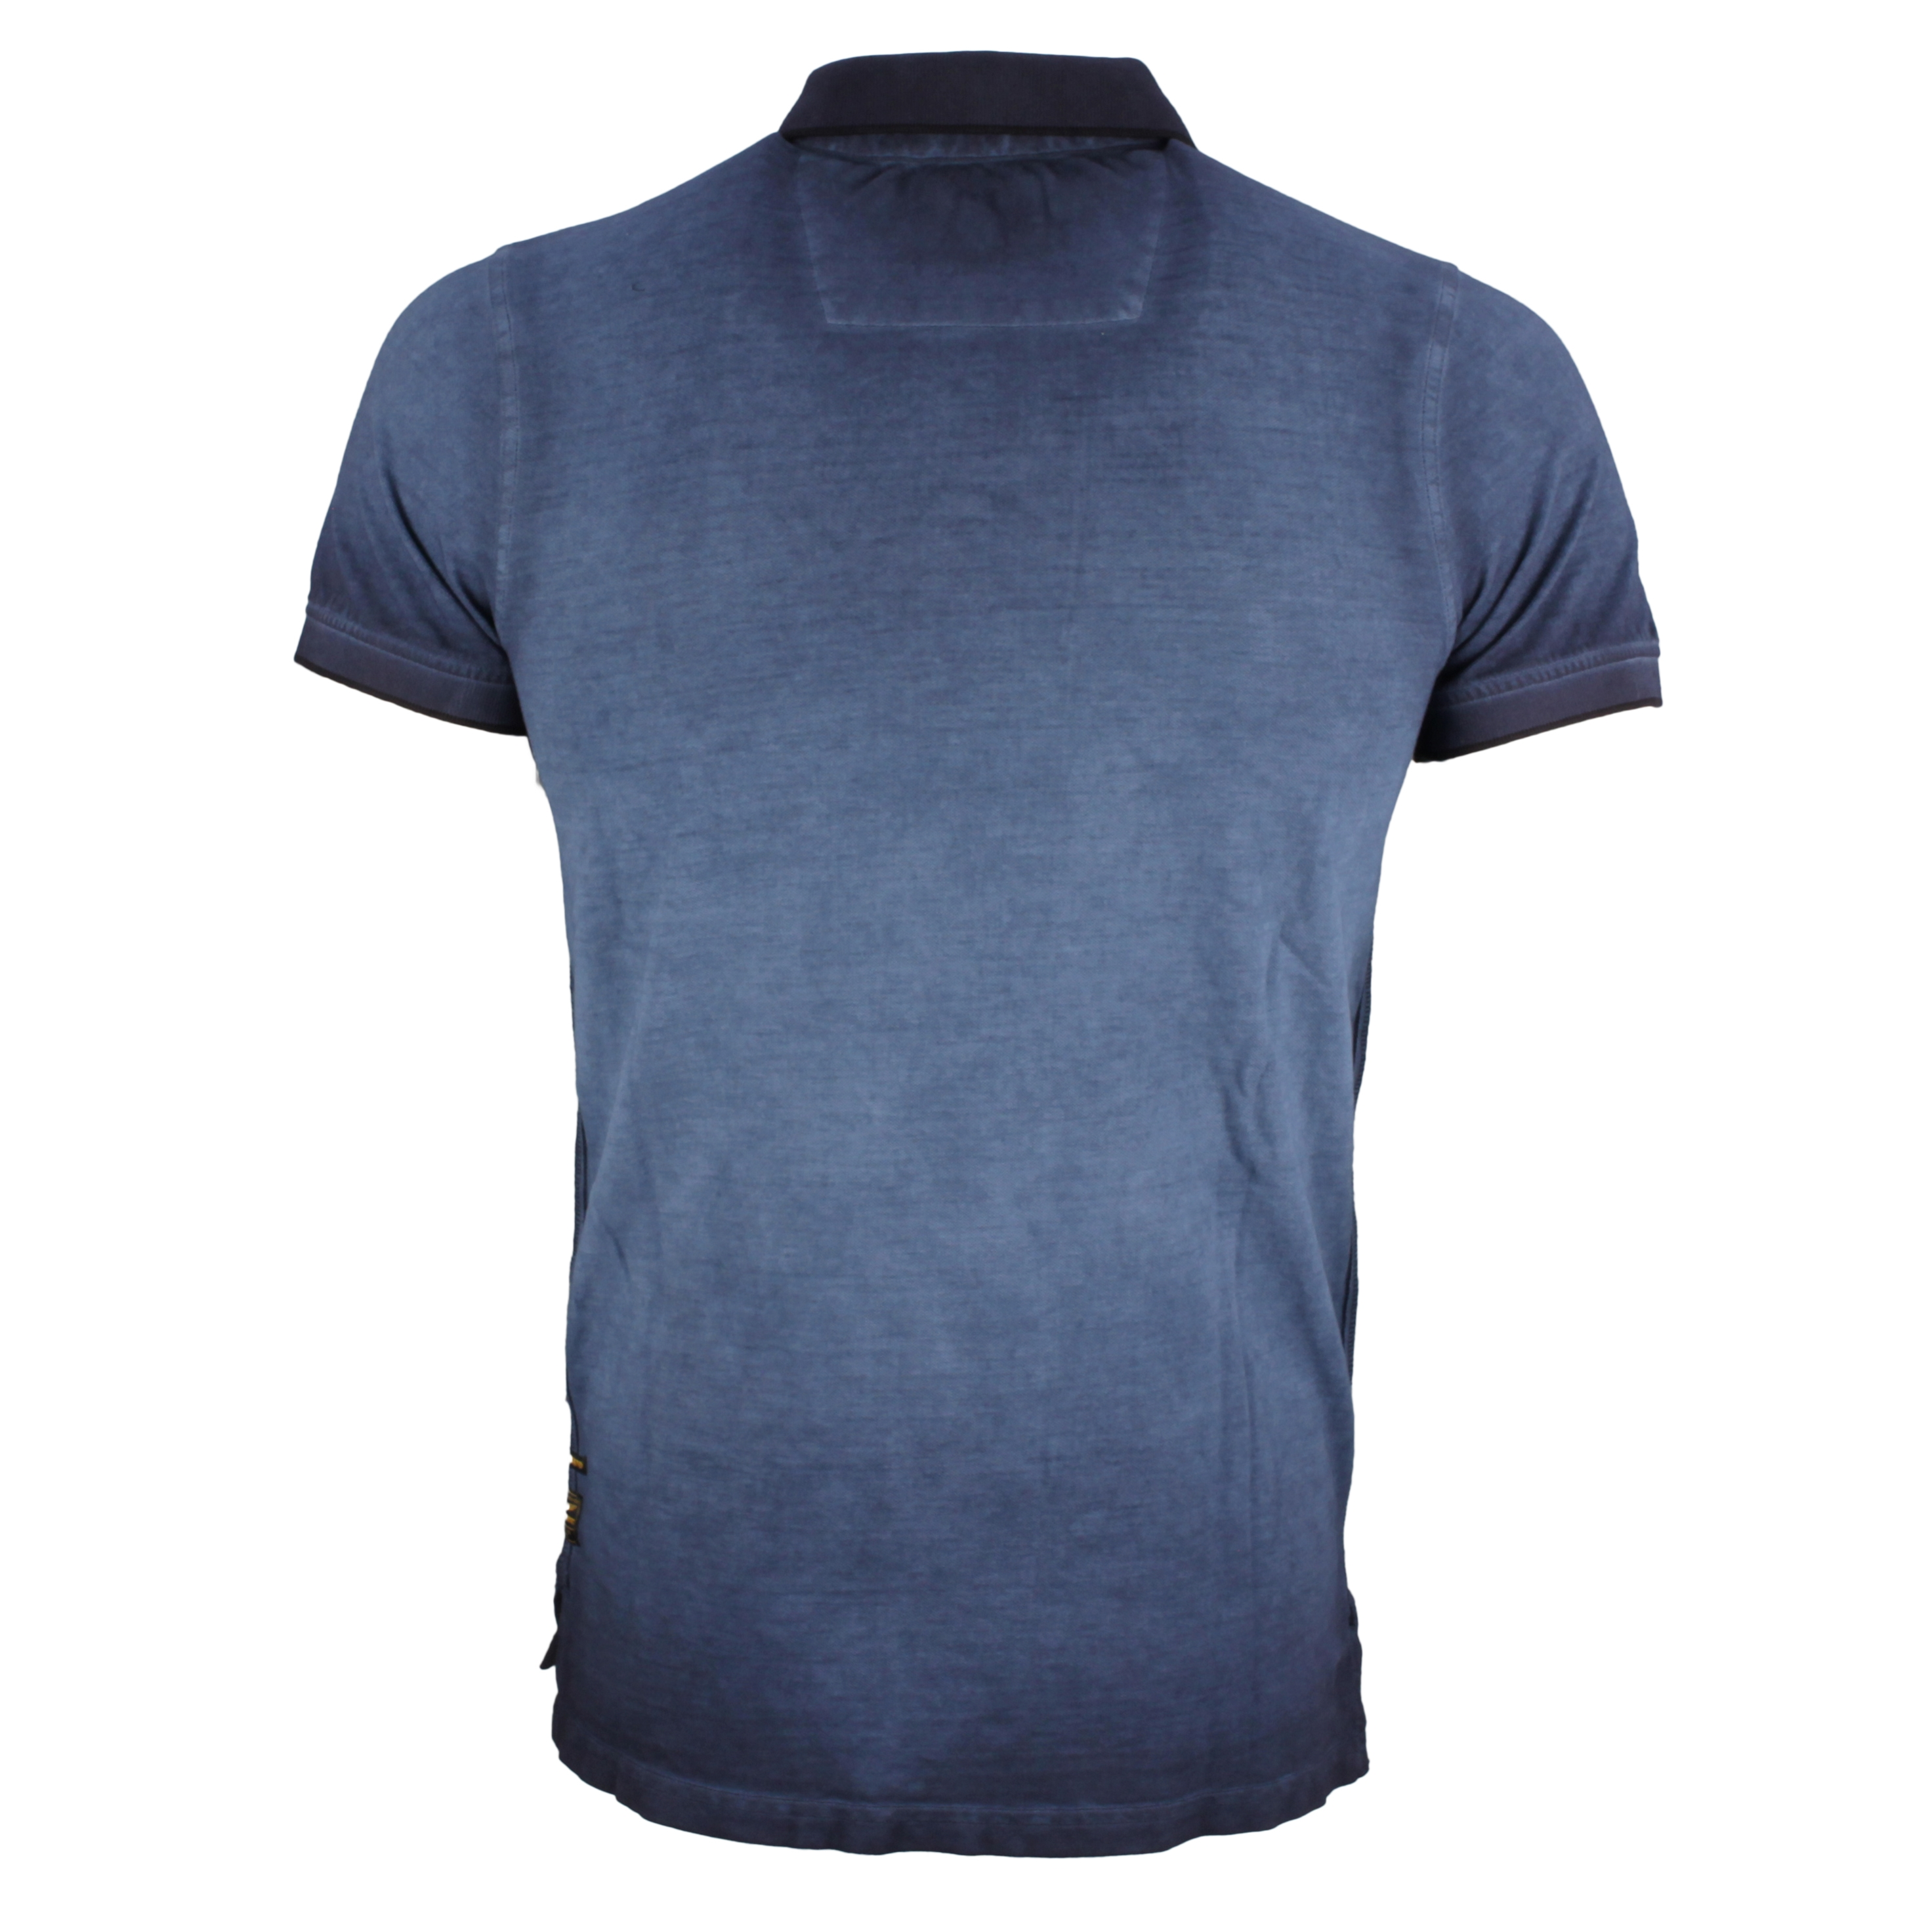 PME Legend Polo Shirt Light Pique Cold blau PPSS203860 5287